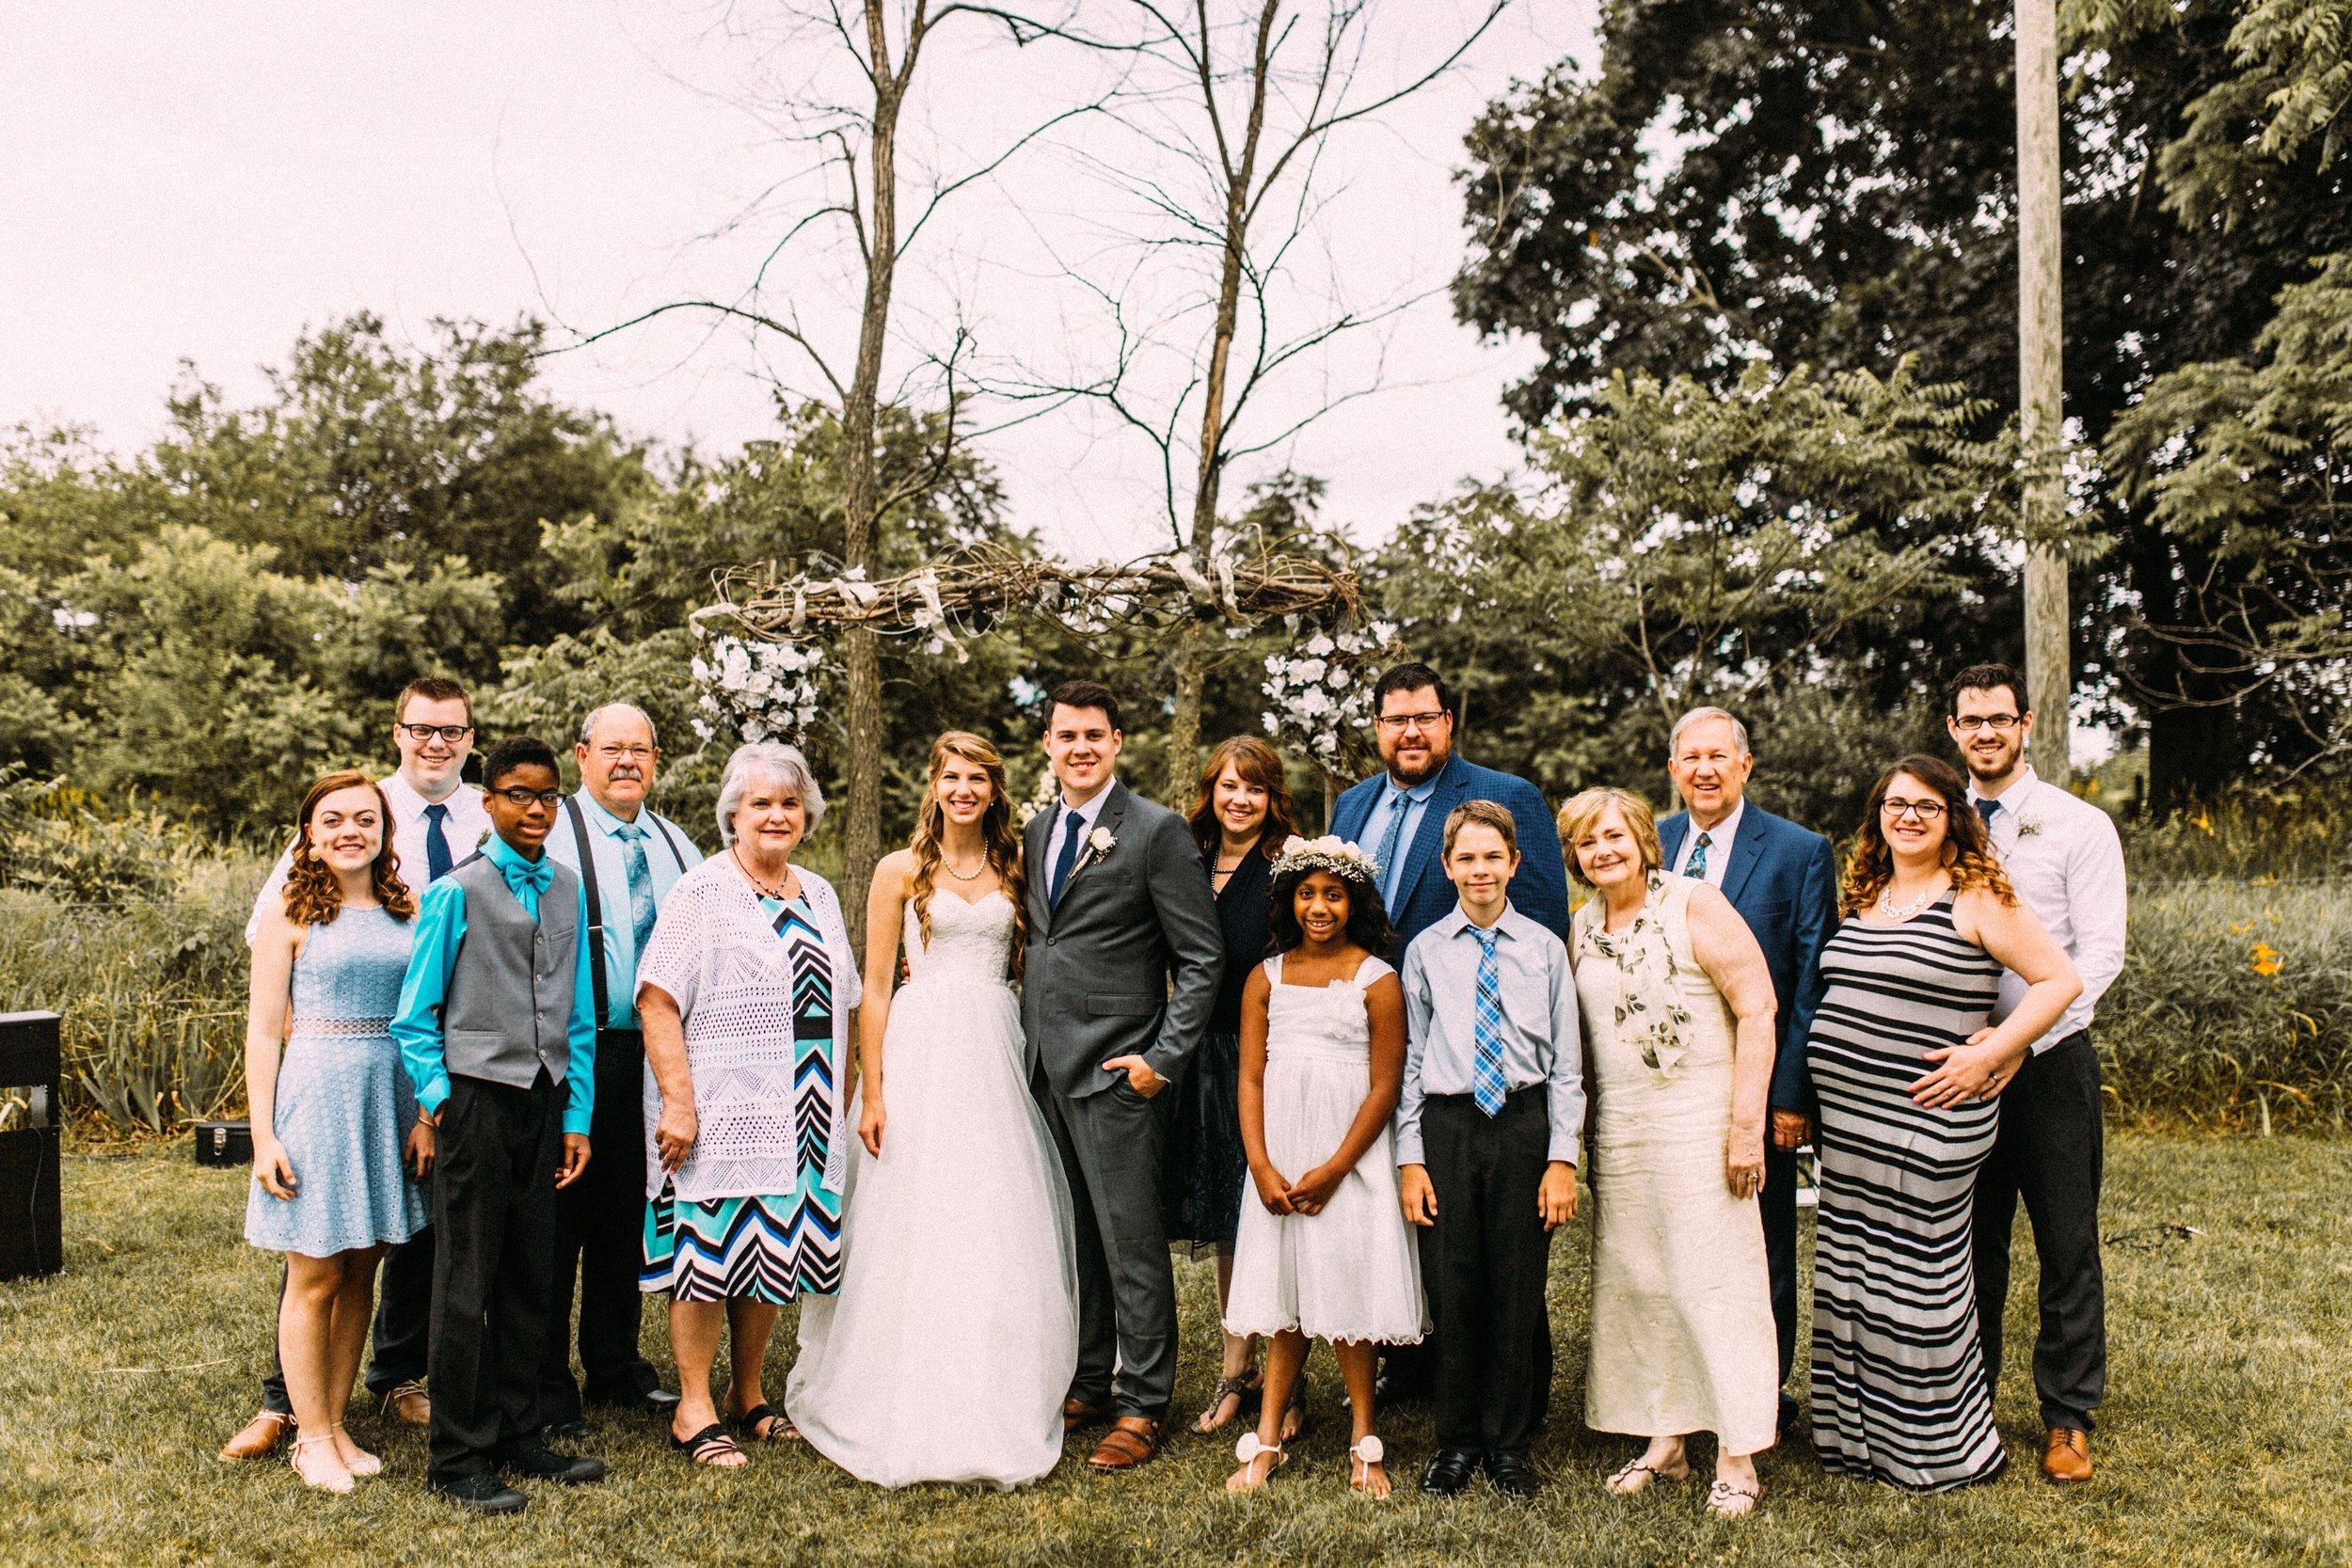 The family at Clayton & Olivia's wedding